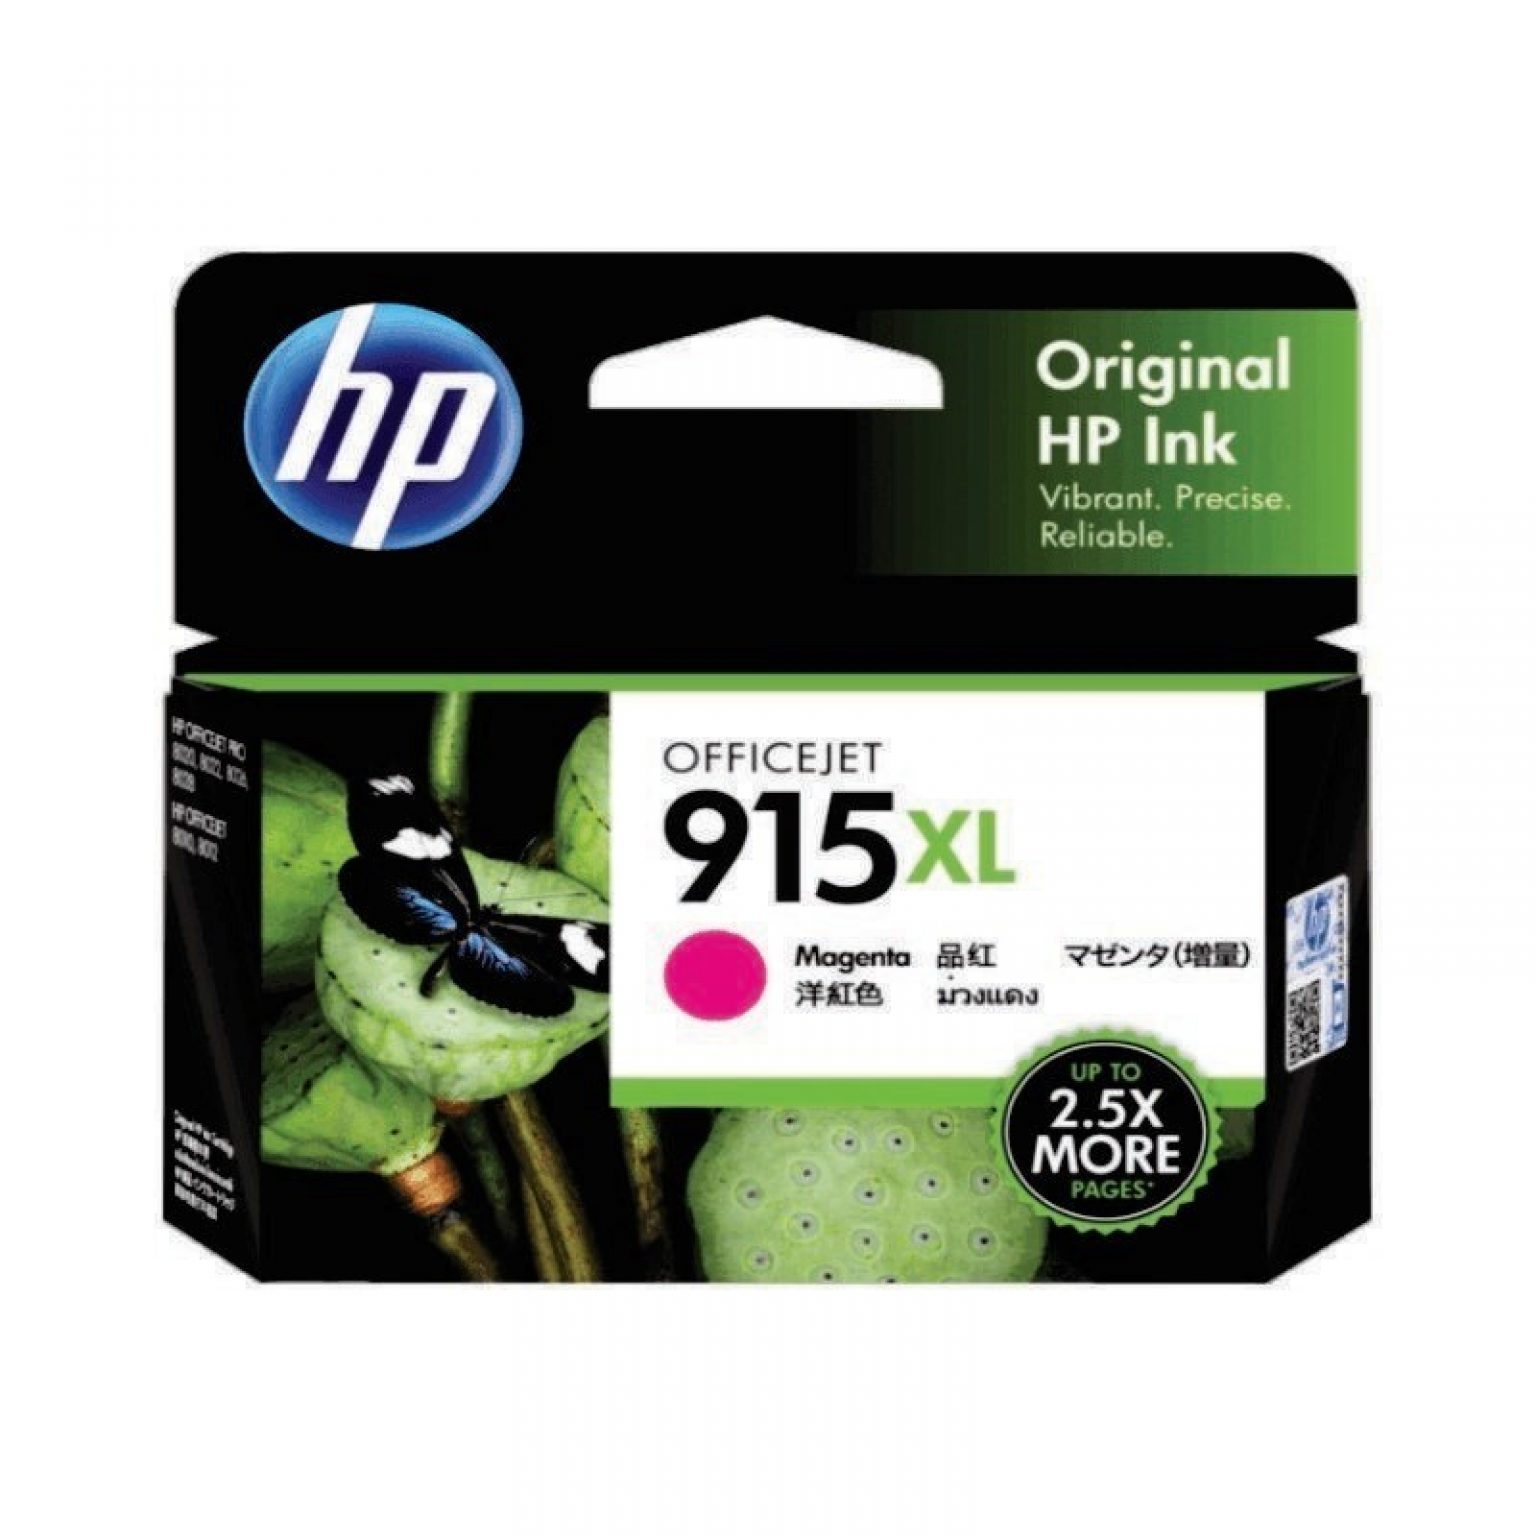 HP - 915XL Magenta Original Ink Cartridge [3YM20AA]